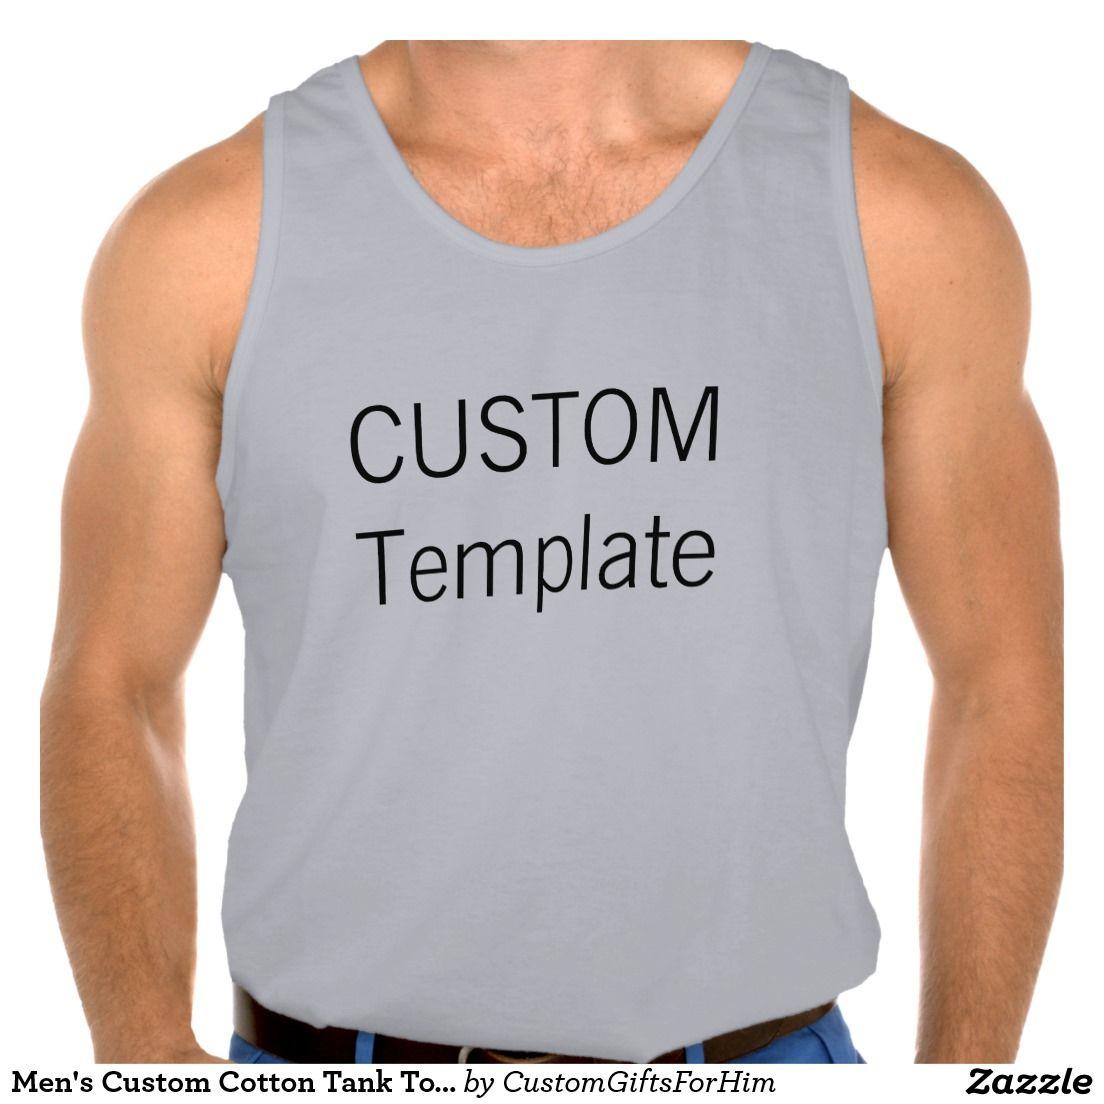 Men's Custom Cotton Tank Top SPORT GREY